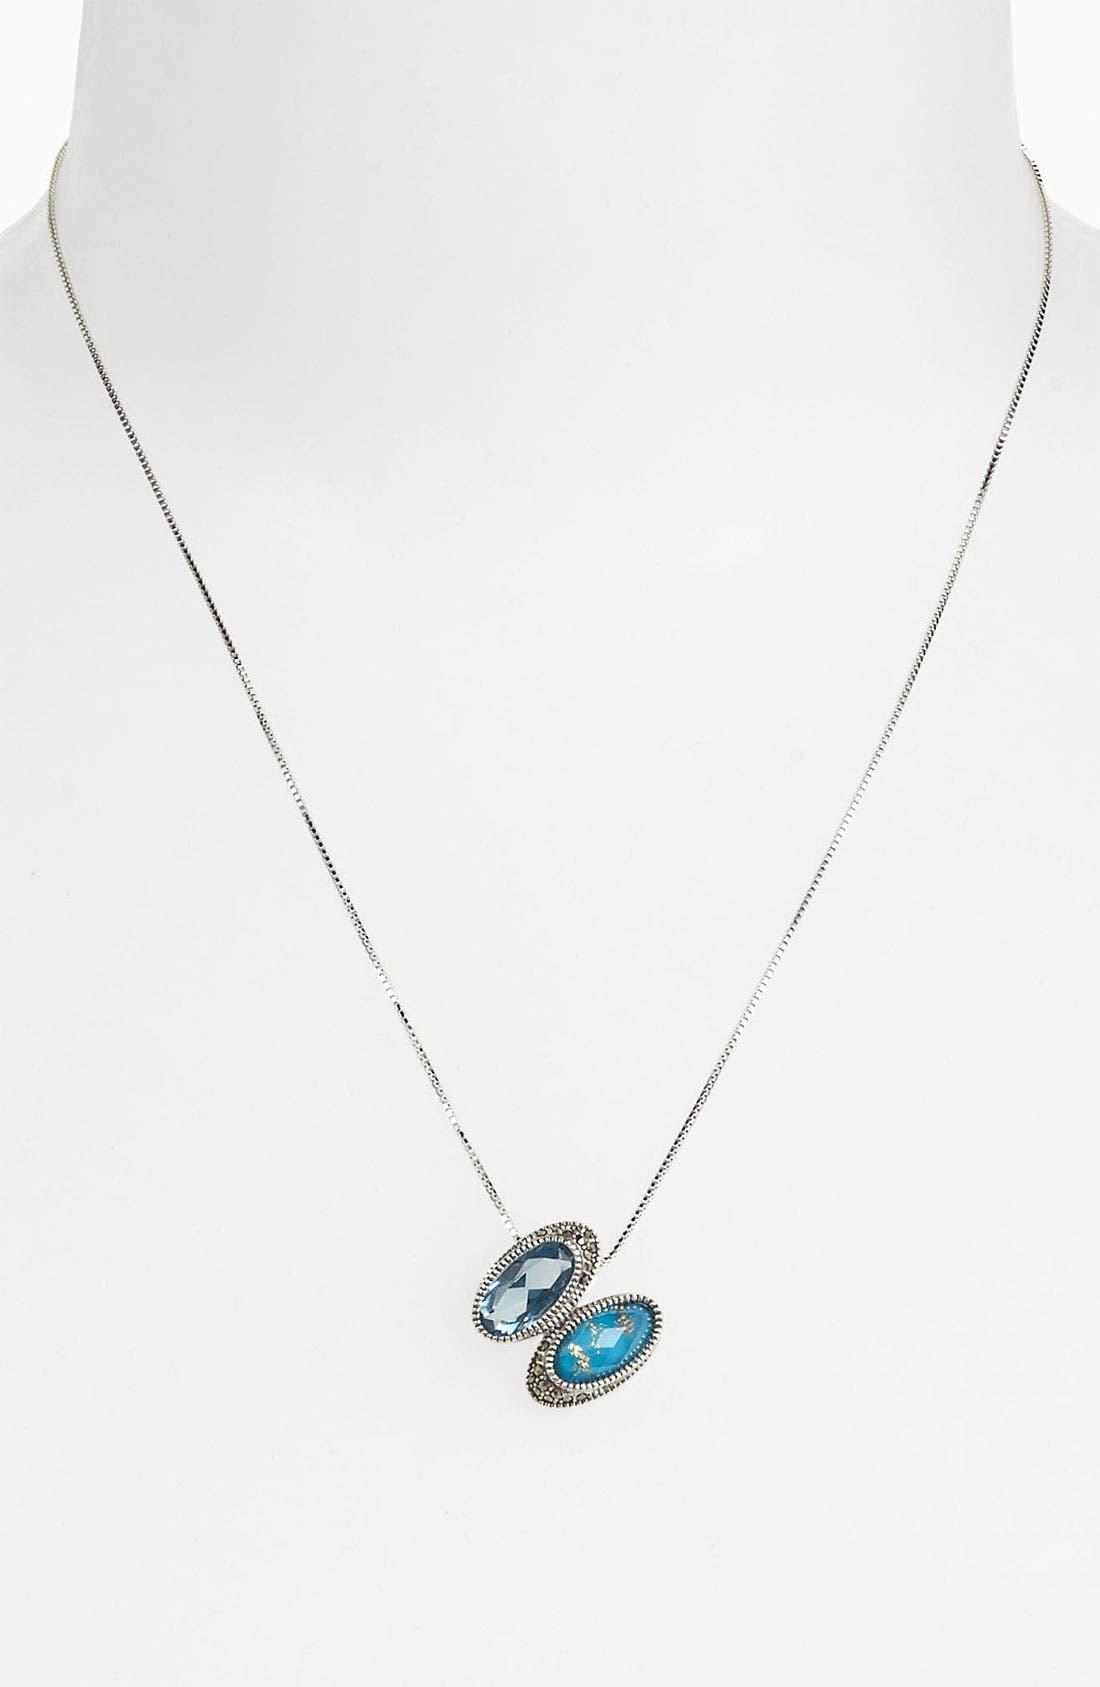 Alternate Image 1 Selected - Judith Jack Pendant Necklace